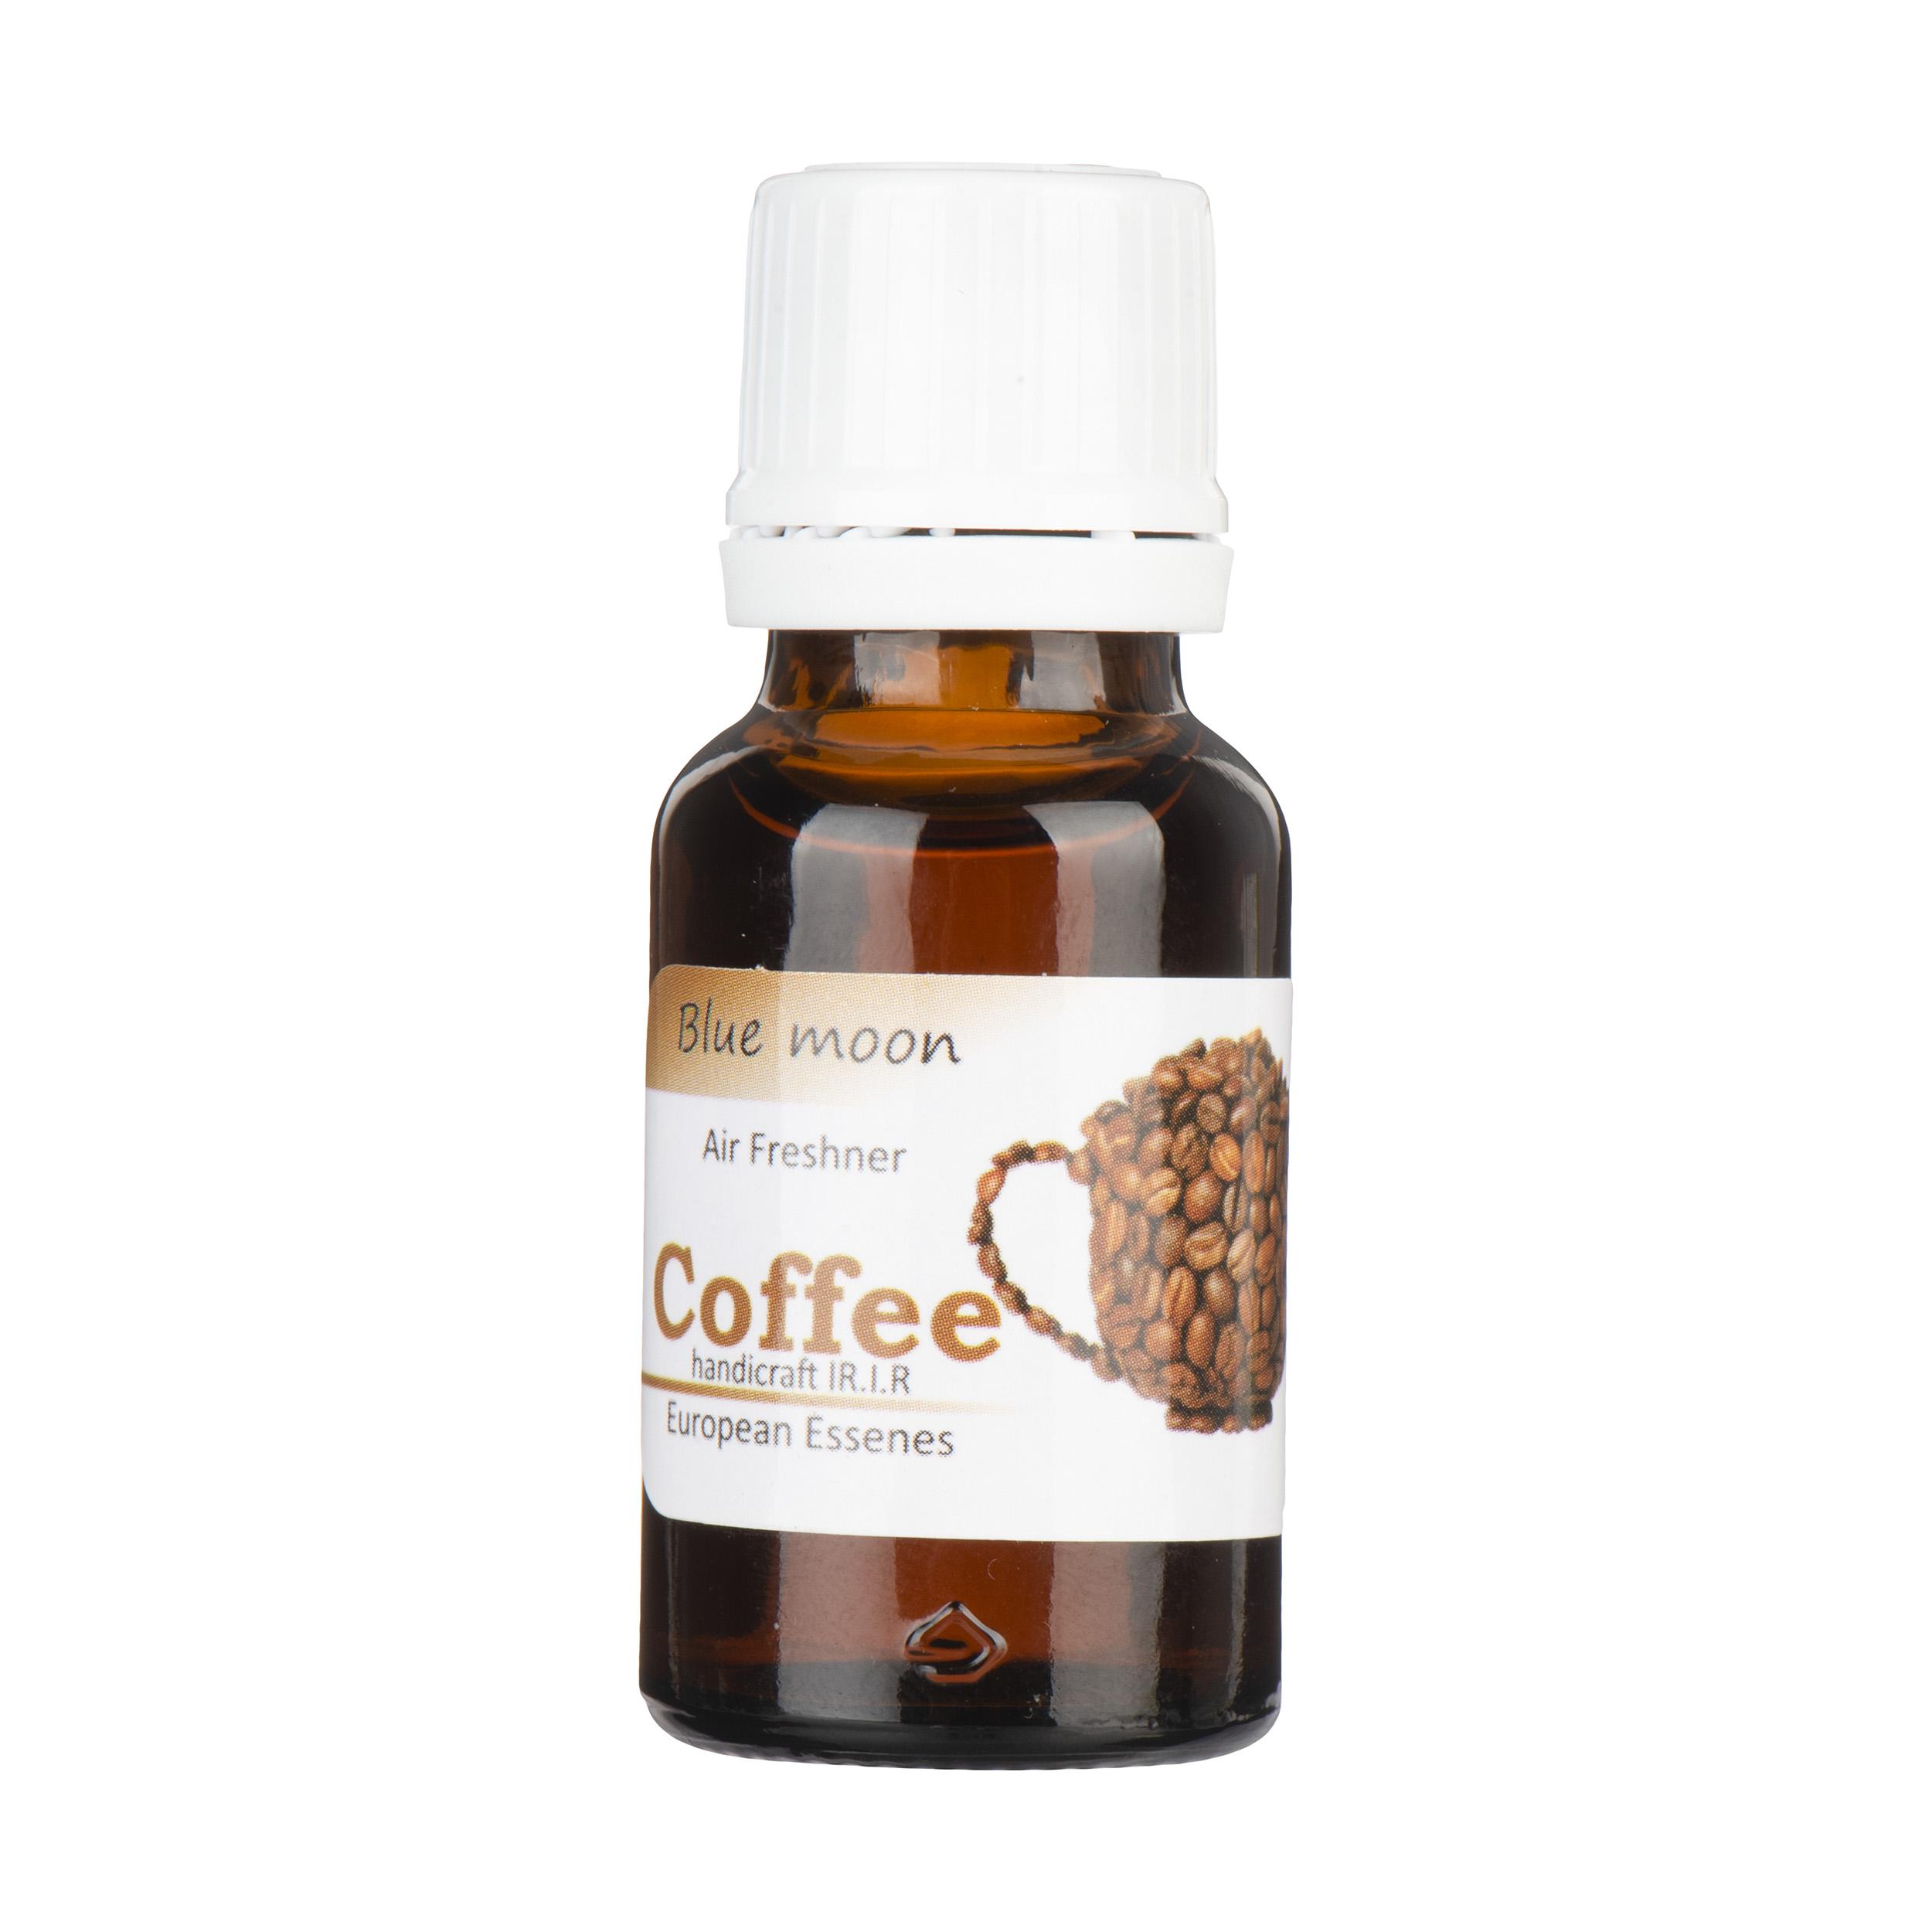 اسانس خوشبوکننده بلومون مدل Bitter coffee حجم 17 میلی لیتر